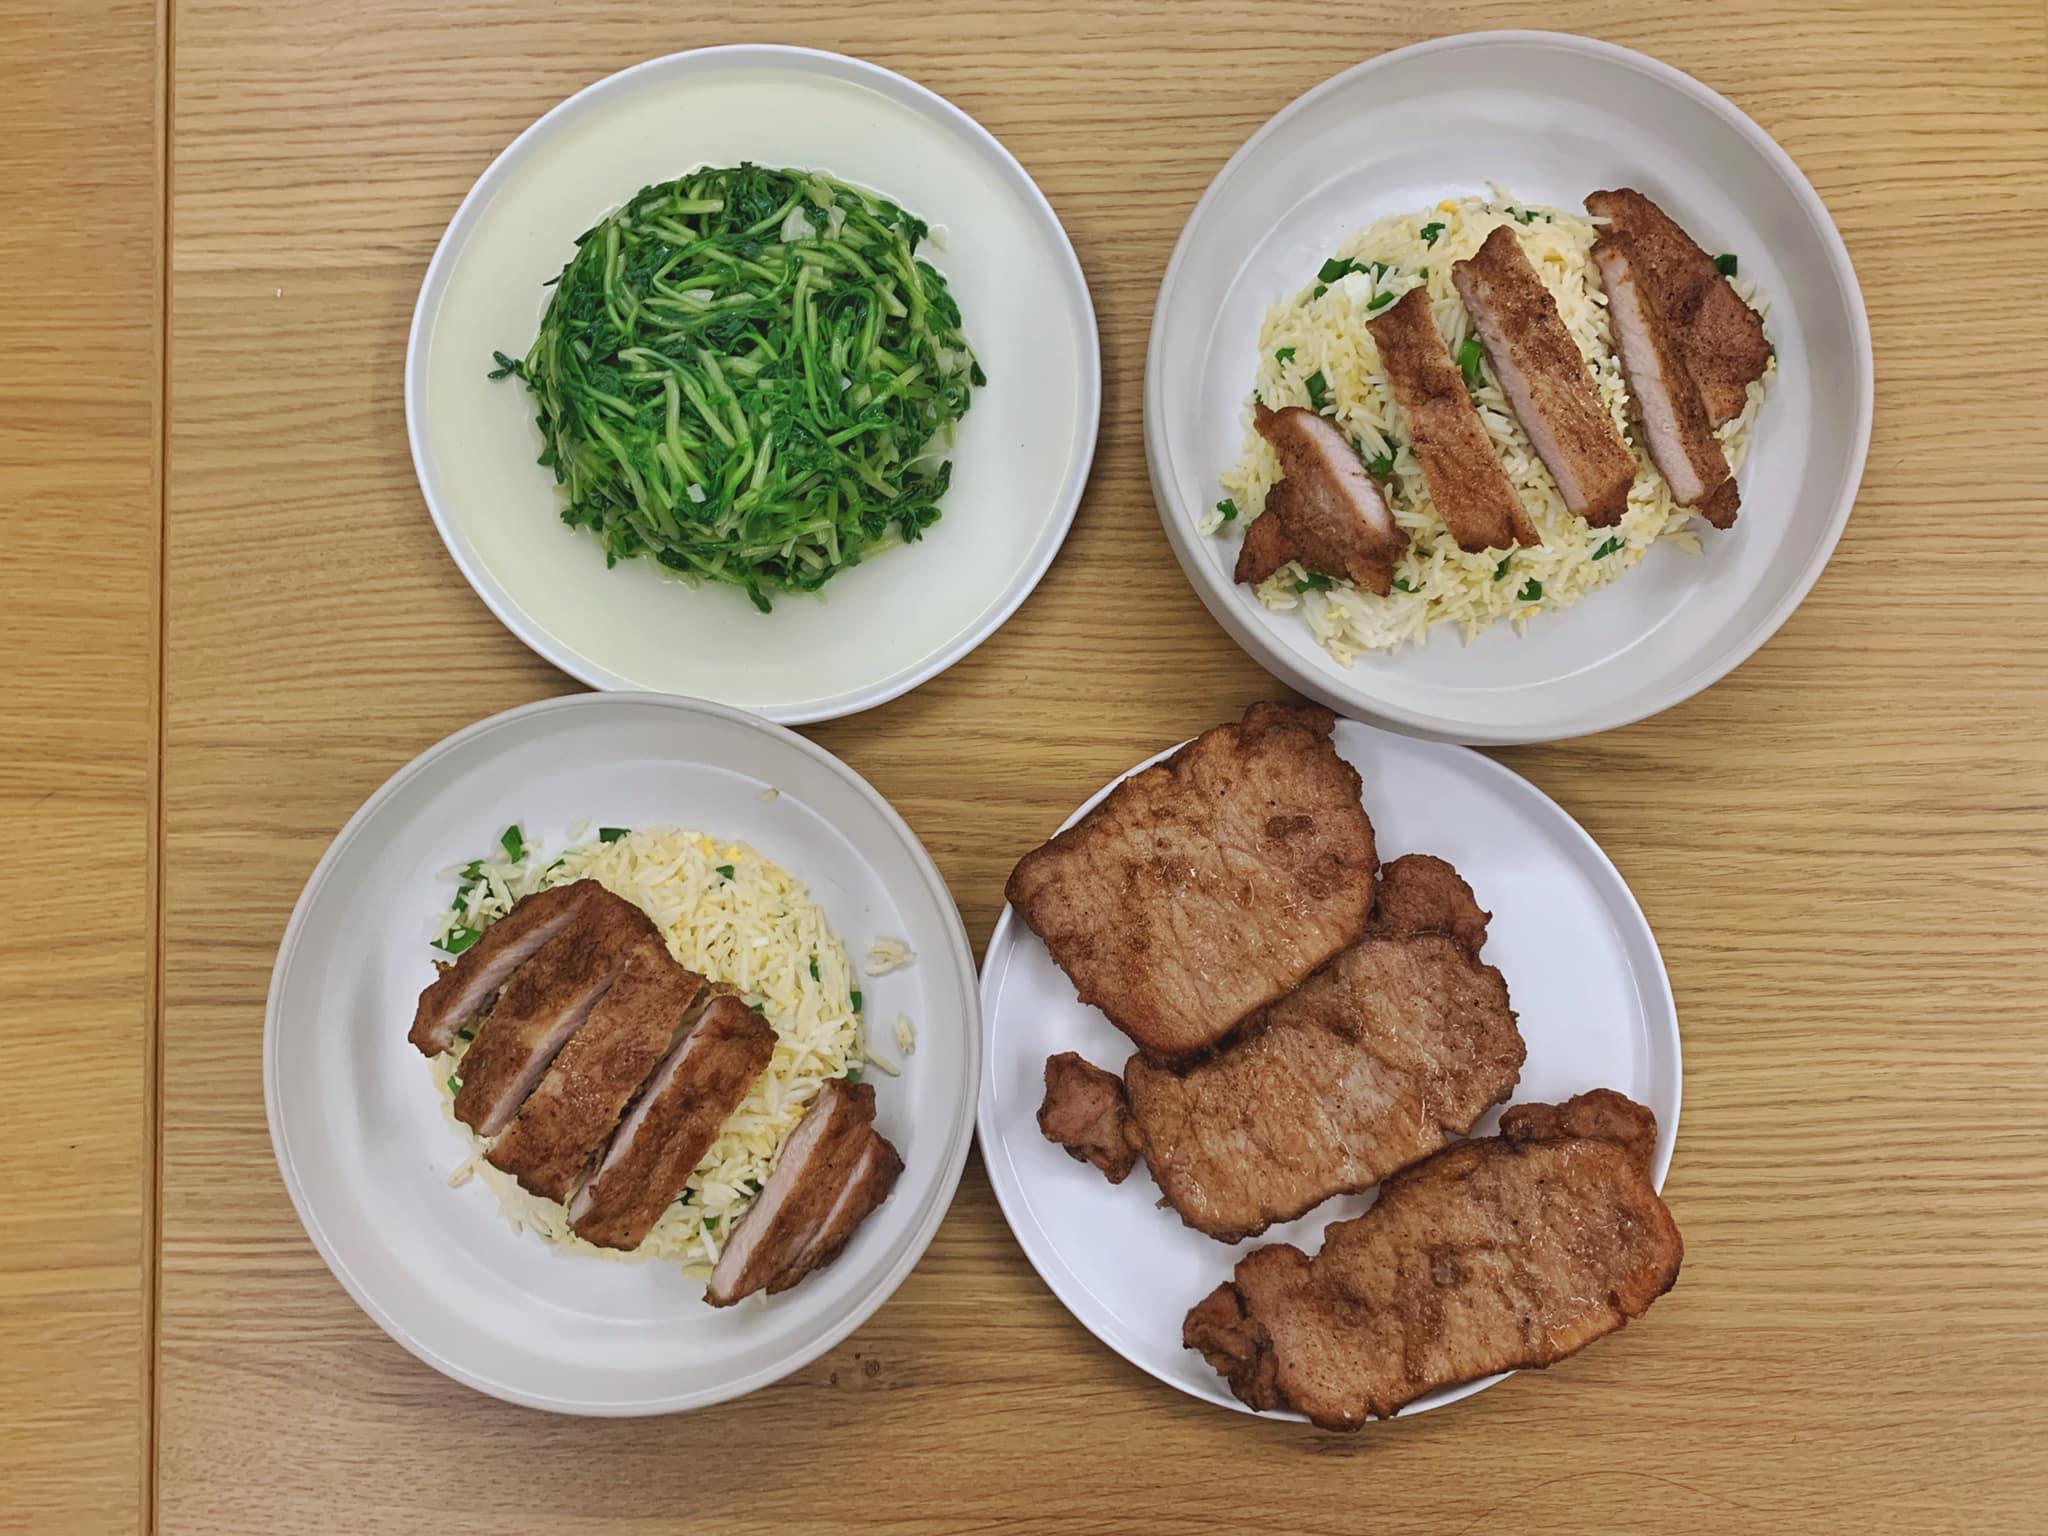 Pork Chops (Ding Tai Fung style)